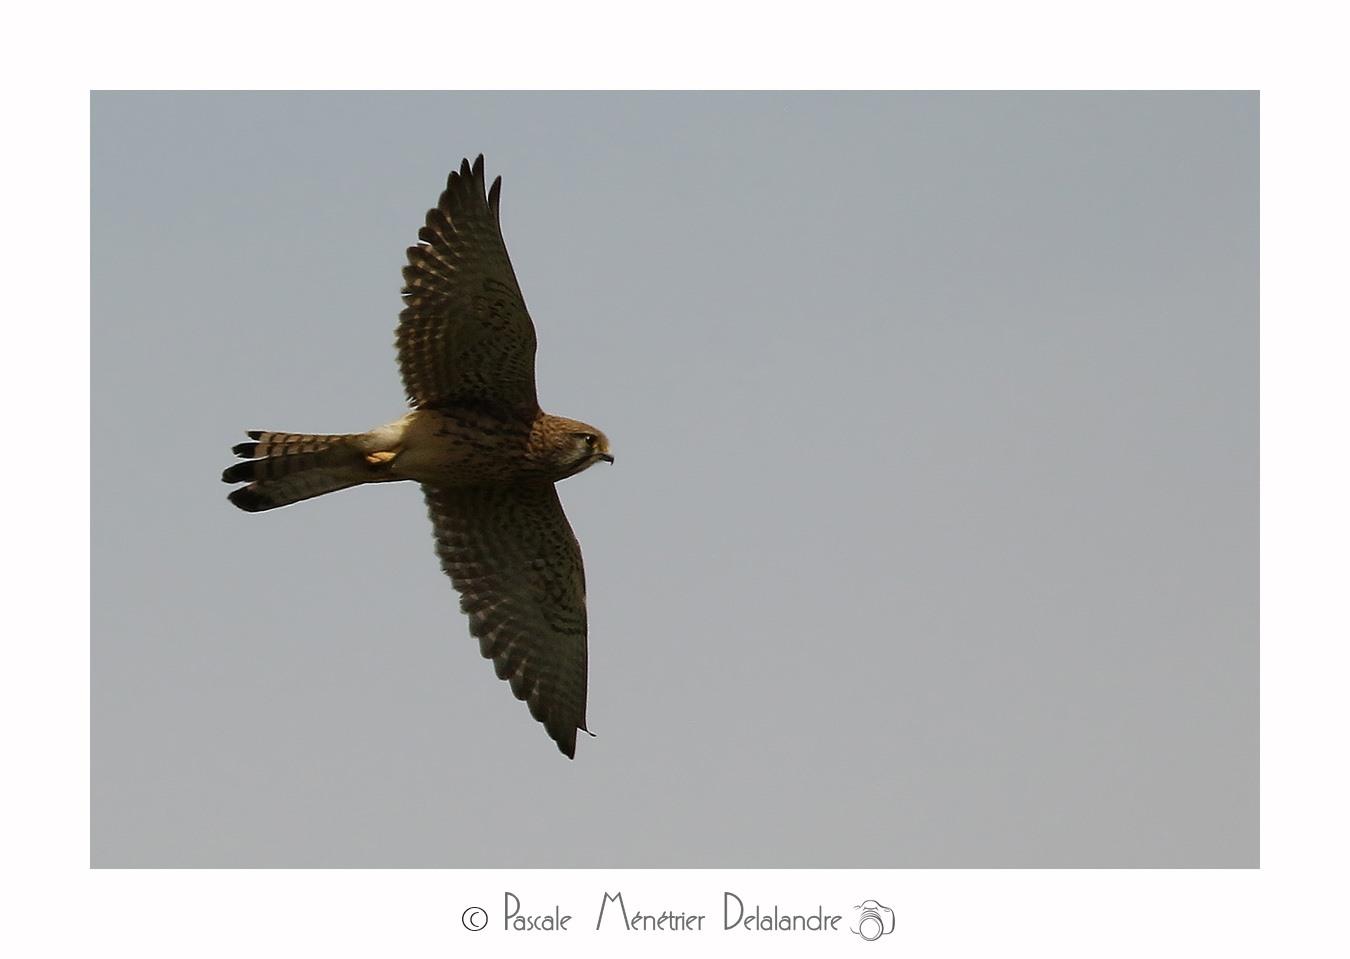 Faucon crécerelle ♀ & ♂ en nuptial